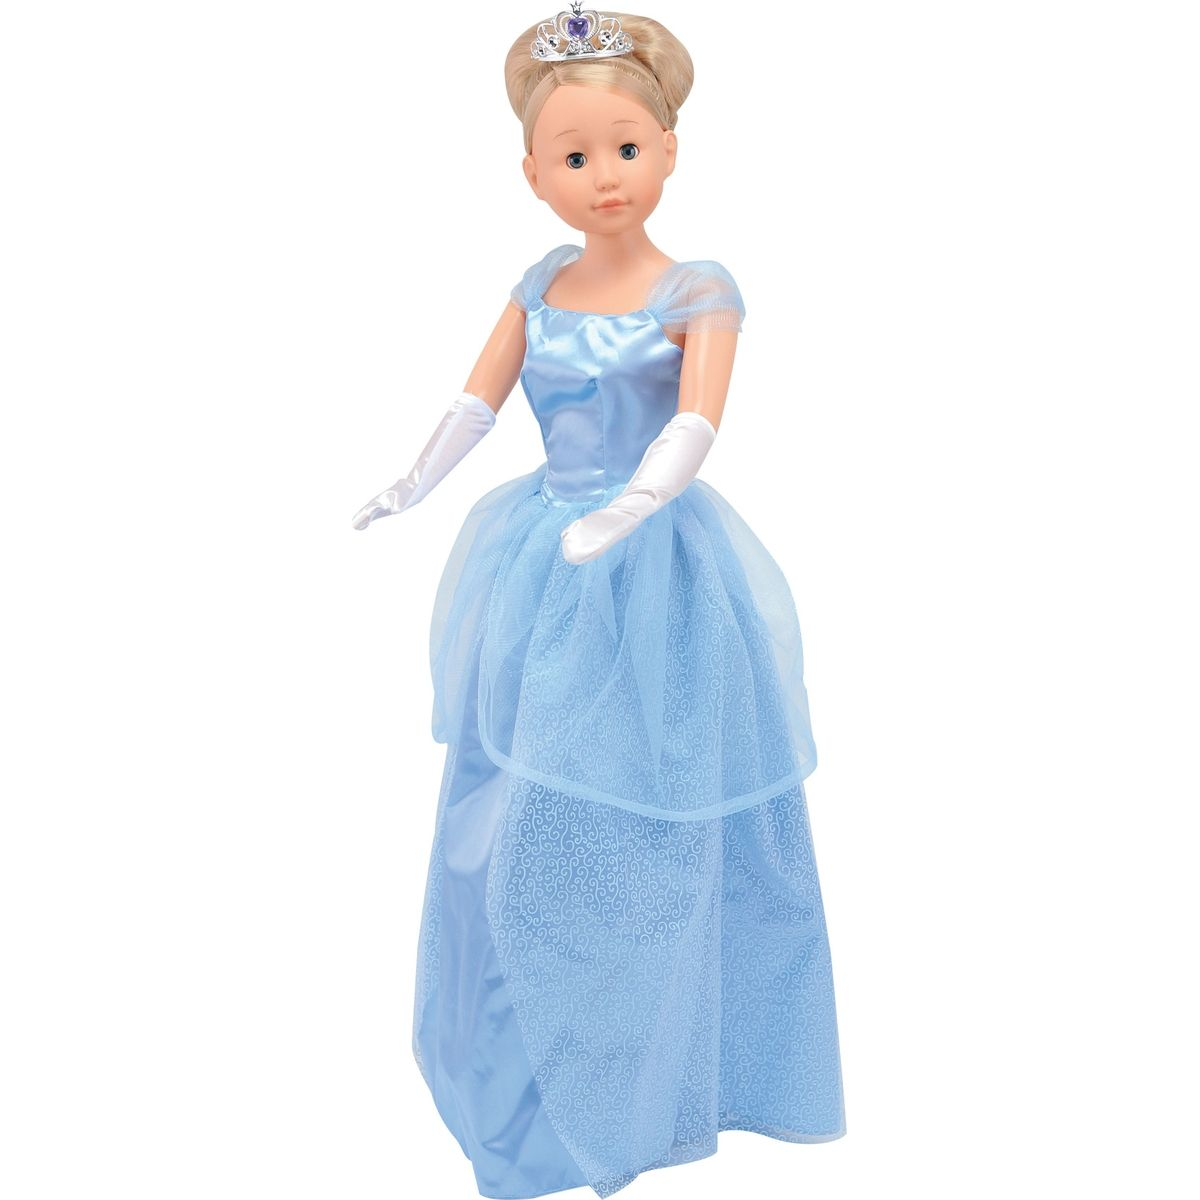 Dimian Panenka Bambolina Molly princezna 90cm Modré šaty